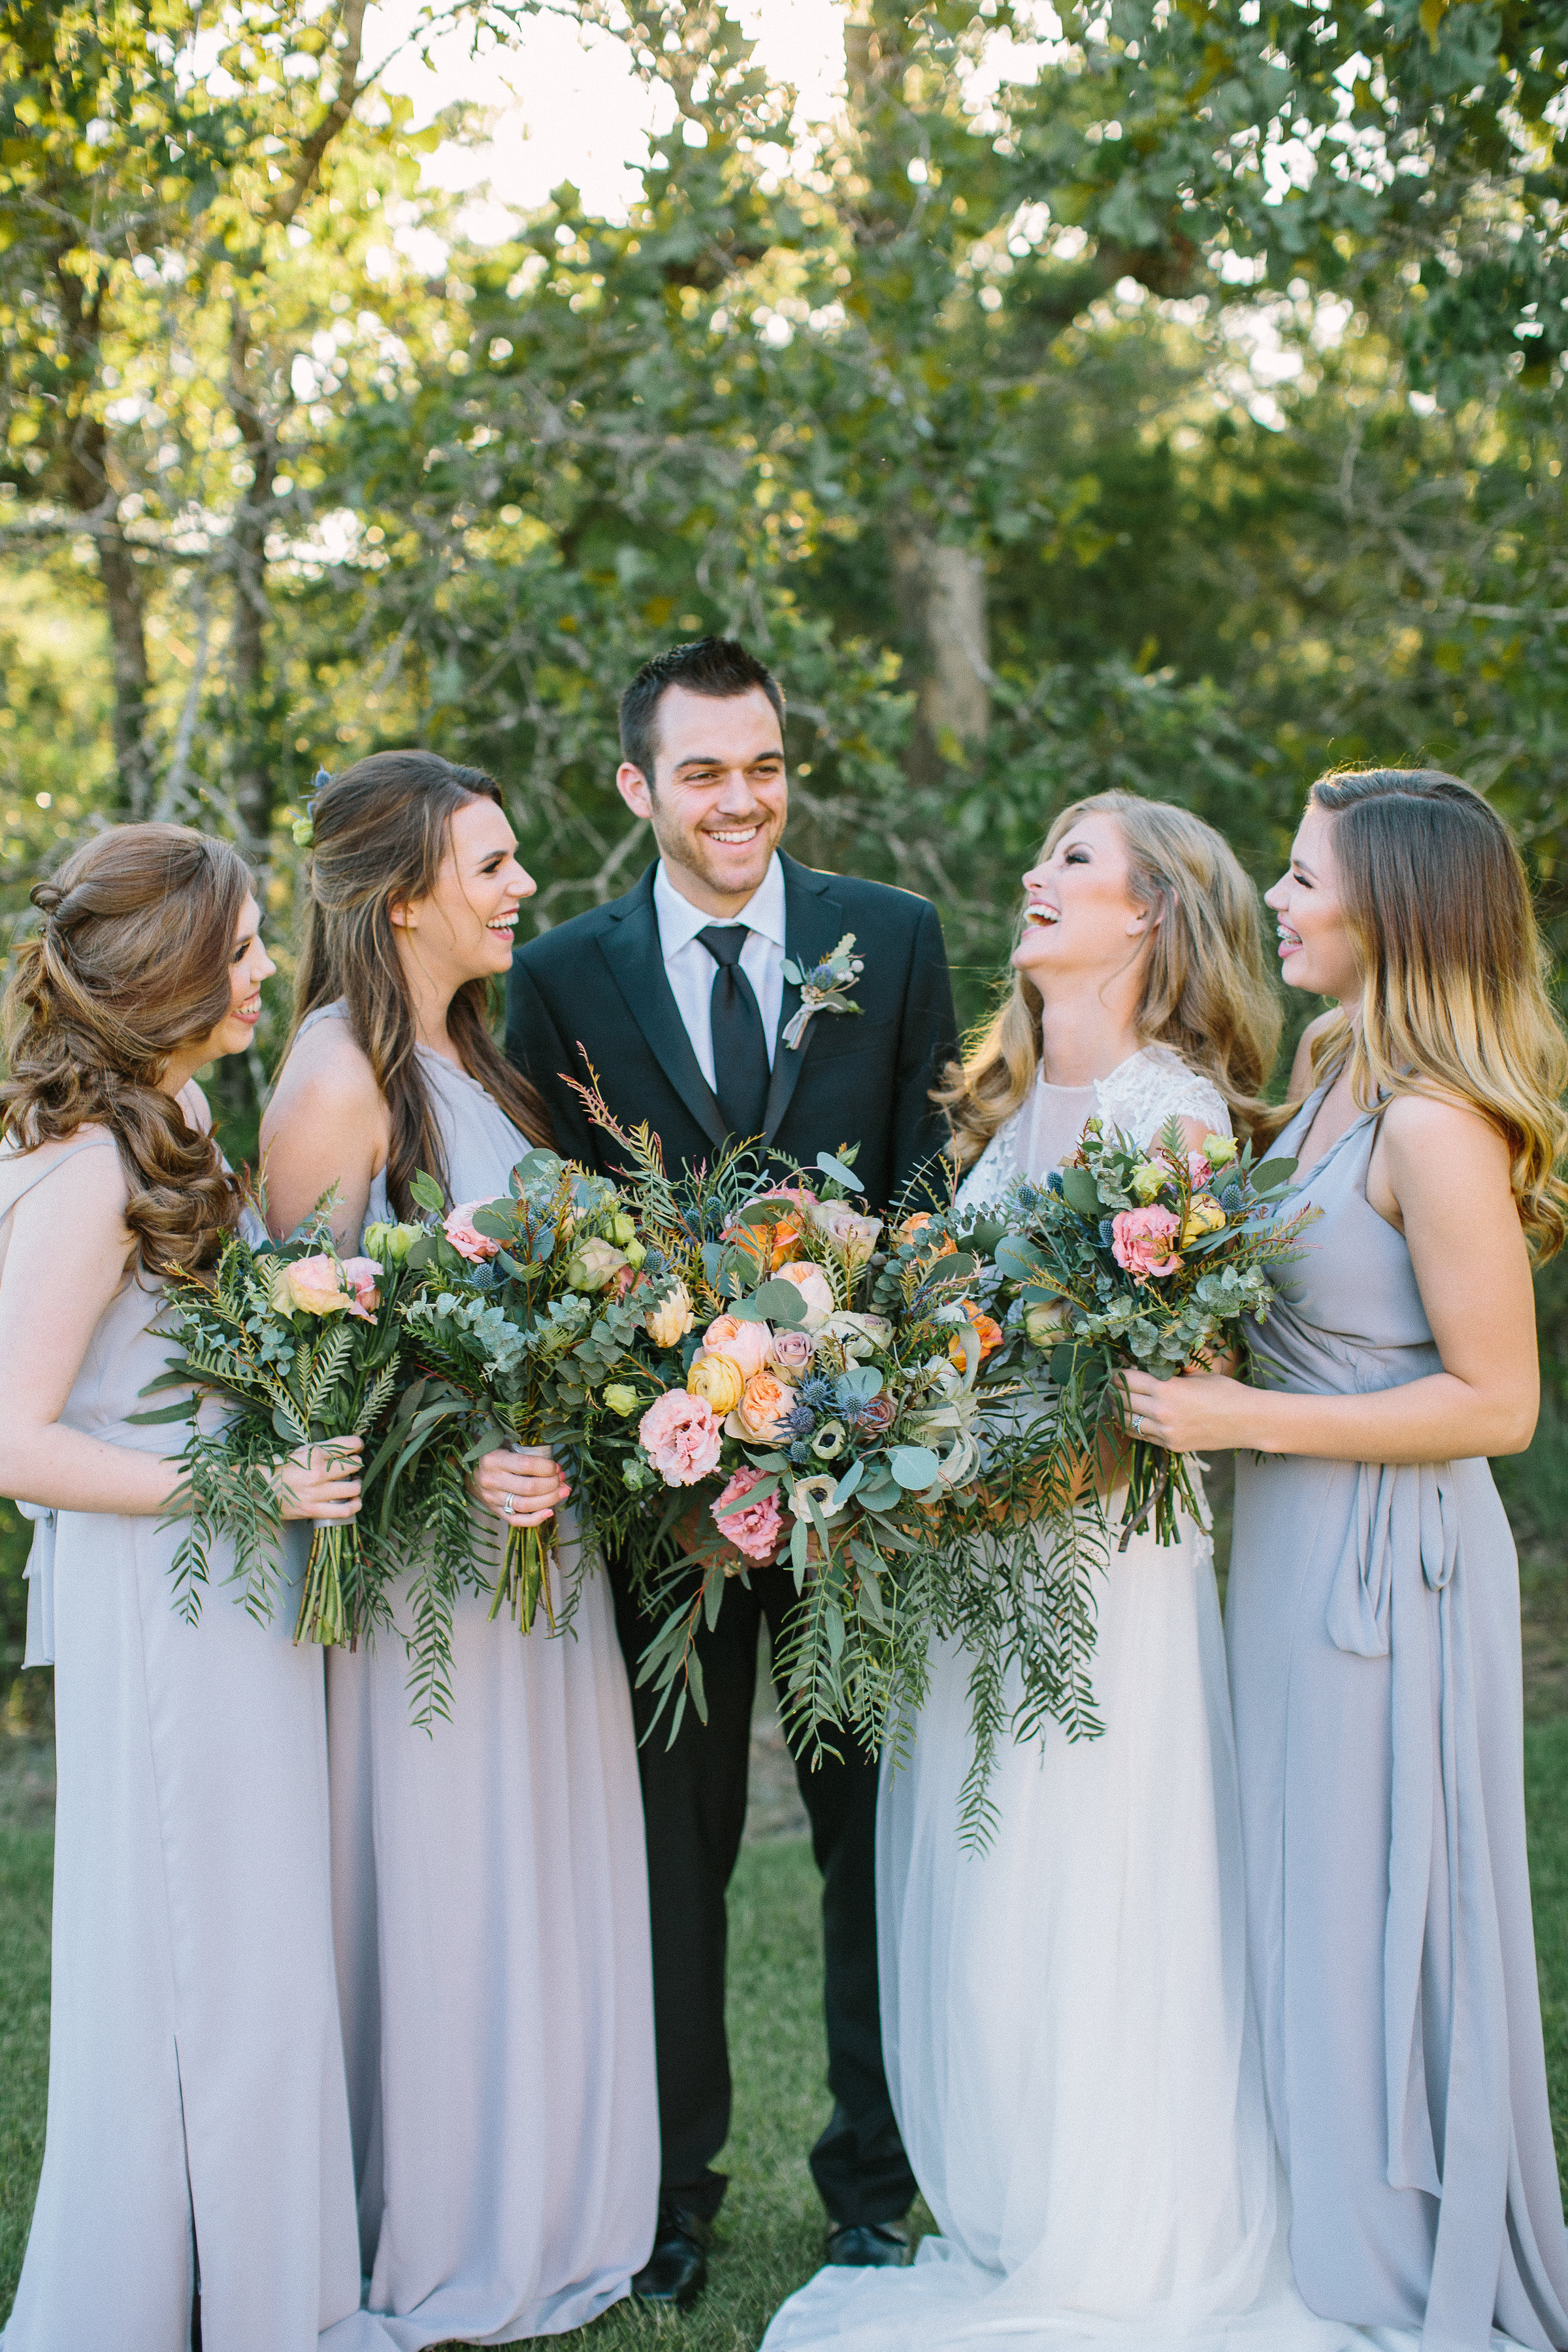 Ellen-Ashton-Photography-Peach-Creek-Ranch-Weddings-Wed-and-Prosper249